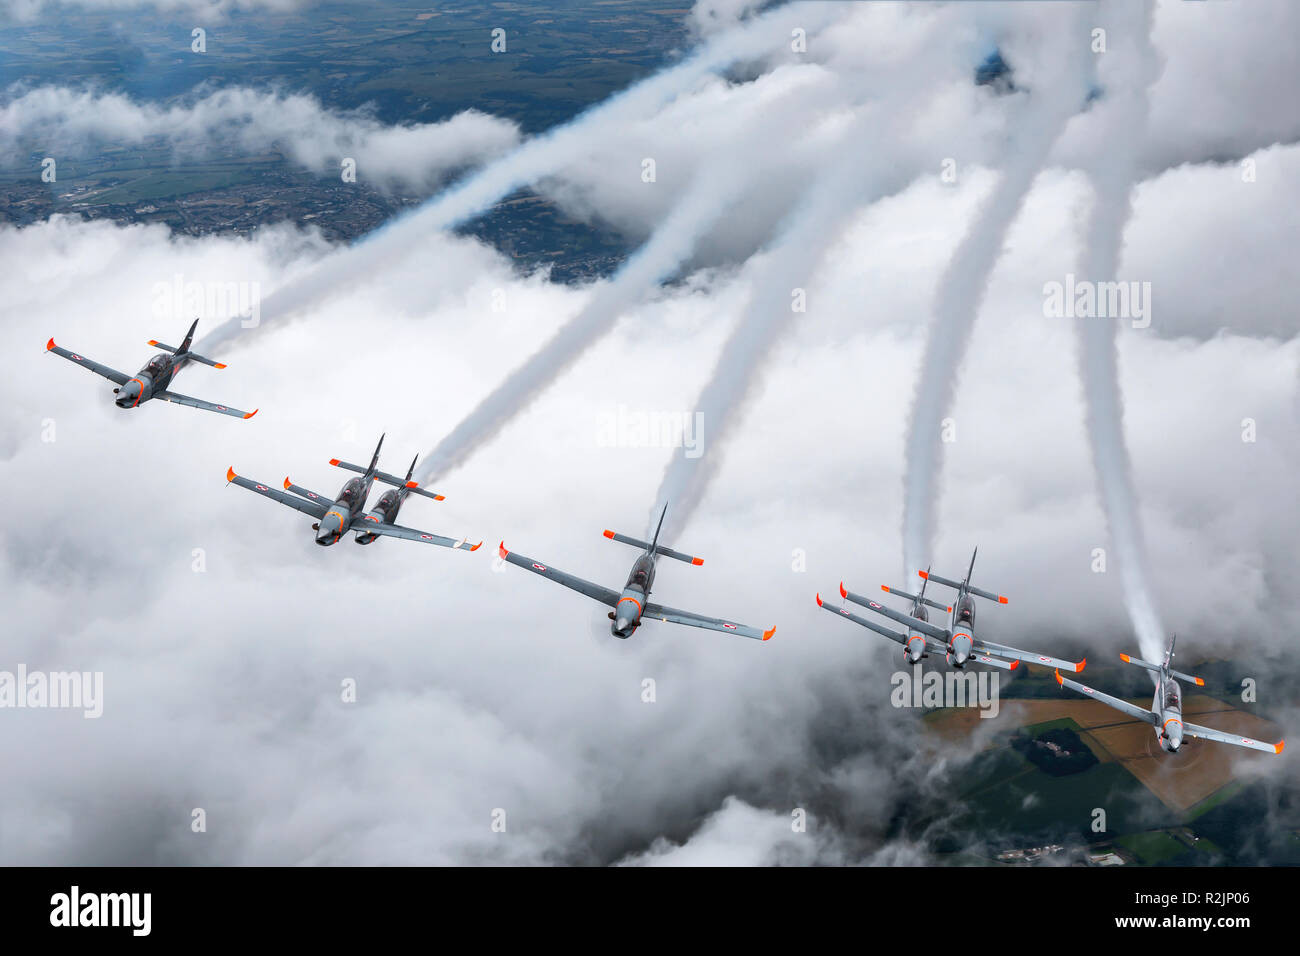 Orlik Aerobatic Team the aerobatic team of the Polish Air Force flying  the PZL-130 Orlik. Photographed at Royal International Air Tattoo (RIAT) - Stock Image